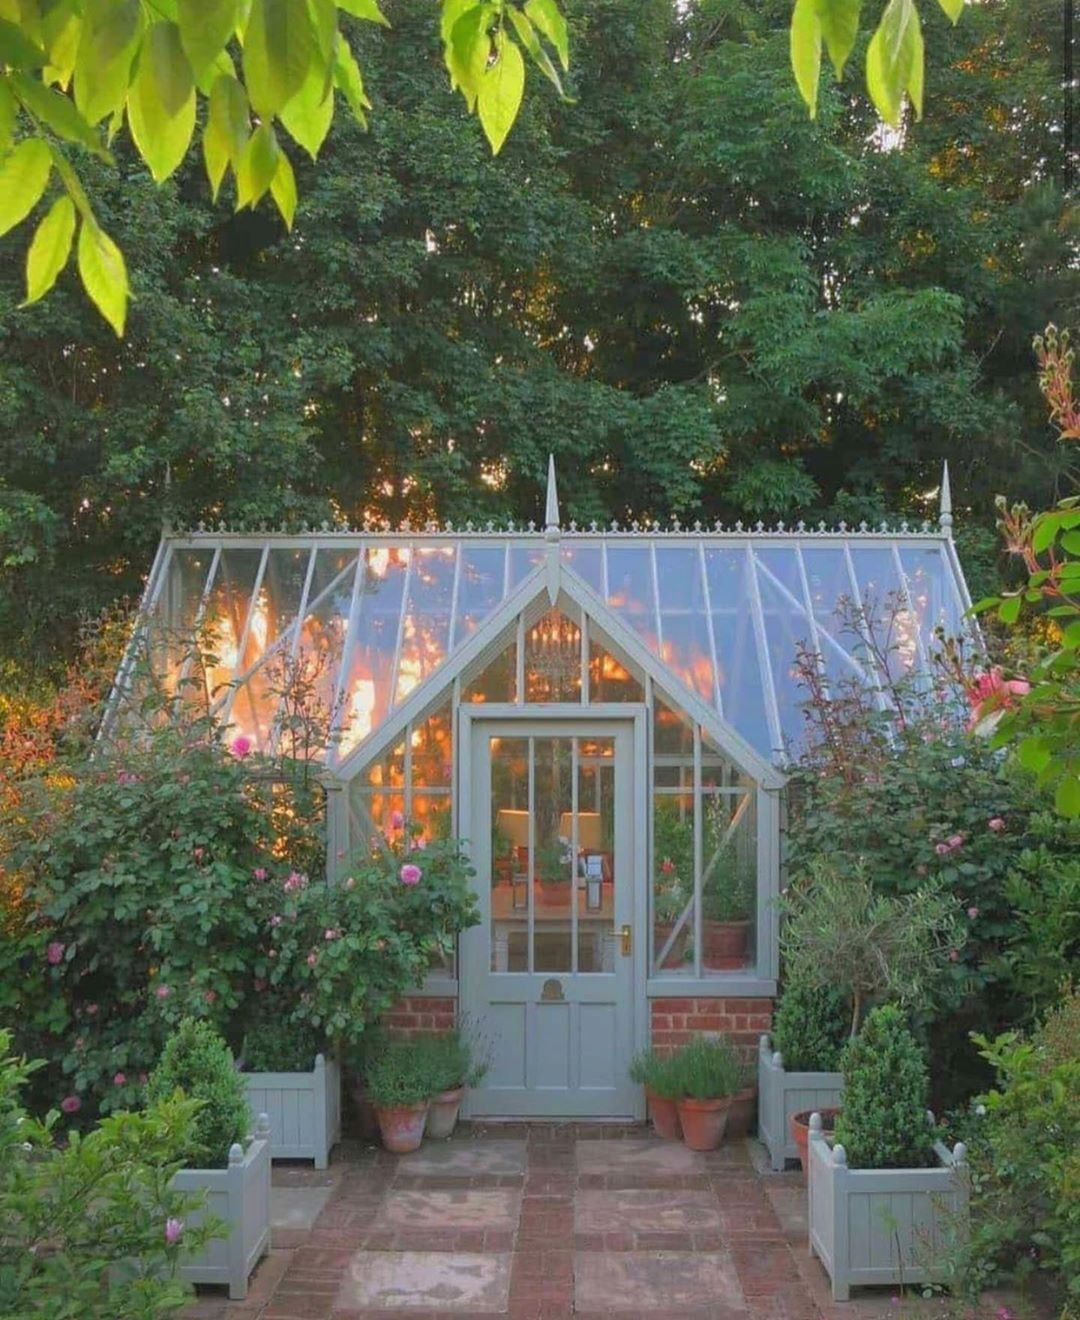 Pin On Cottagecore Dreams Backyard greenhouse arcadia wi